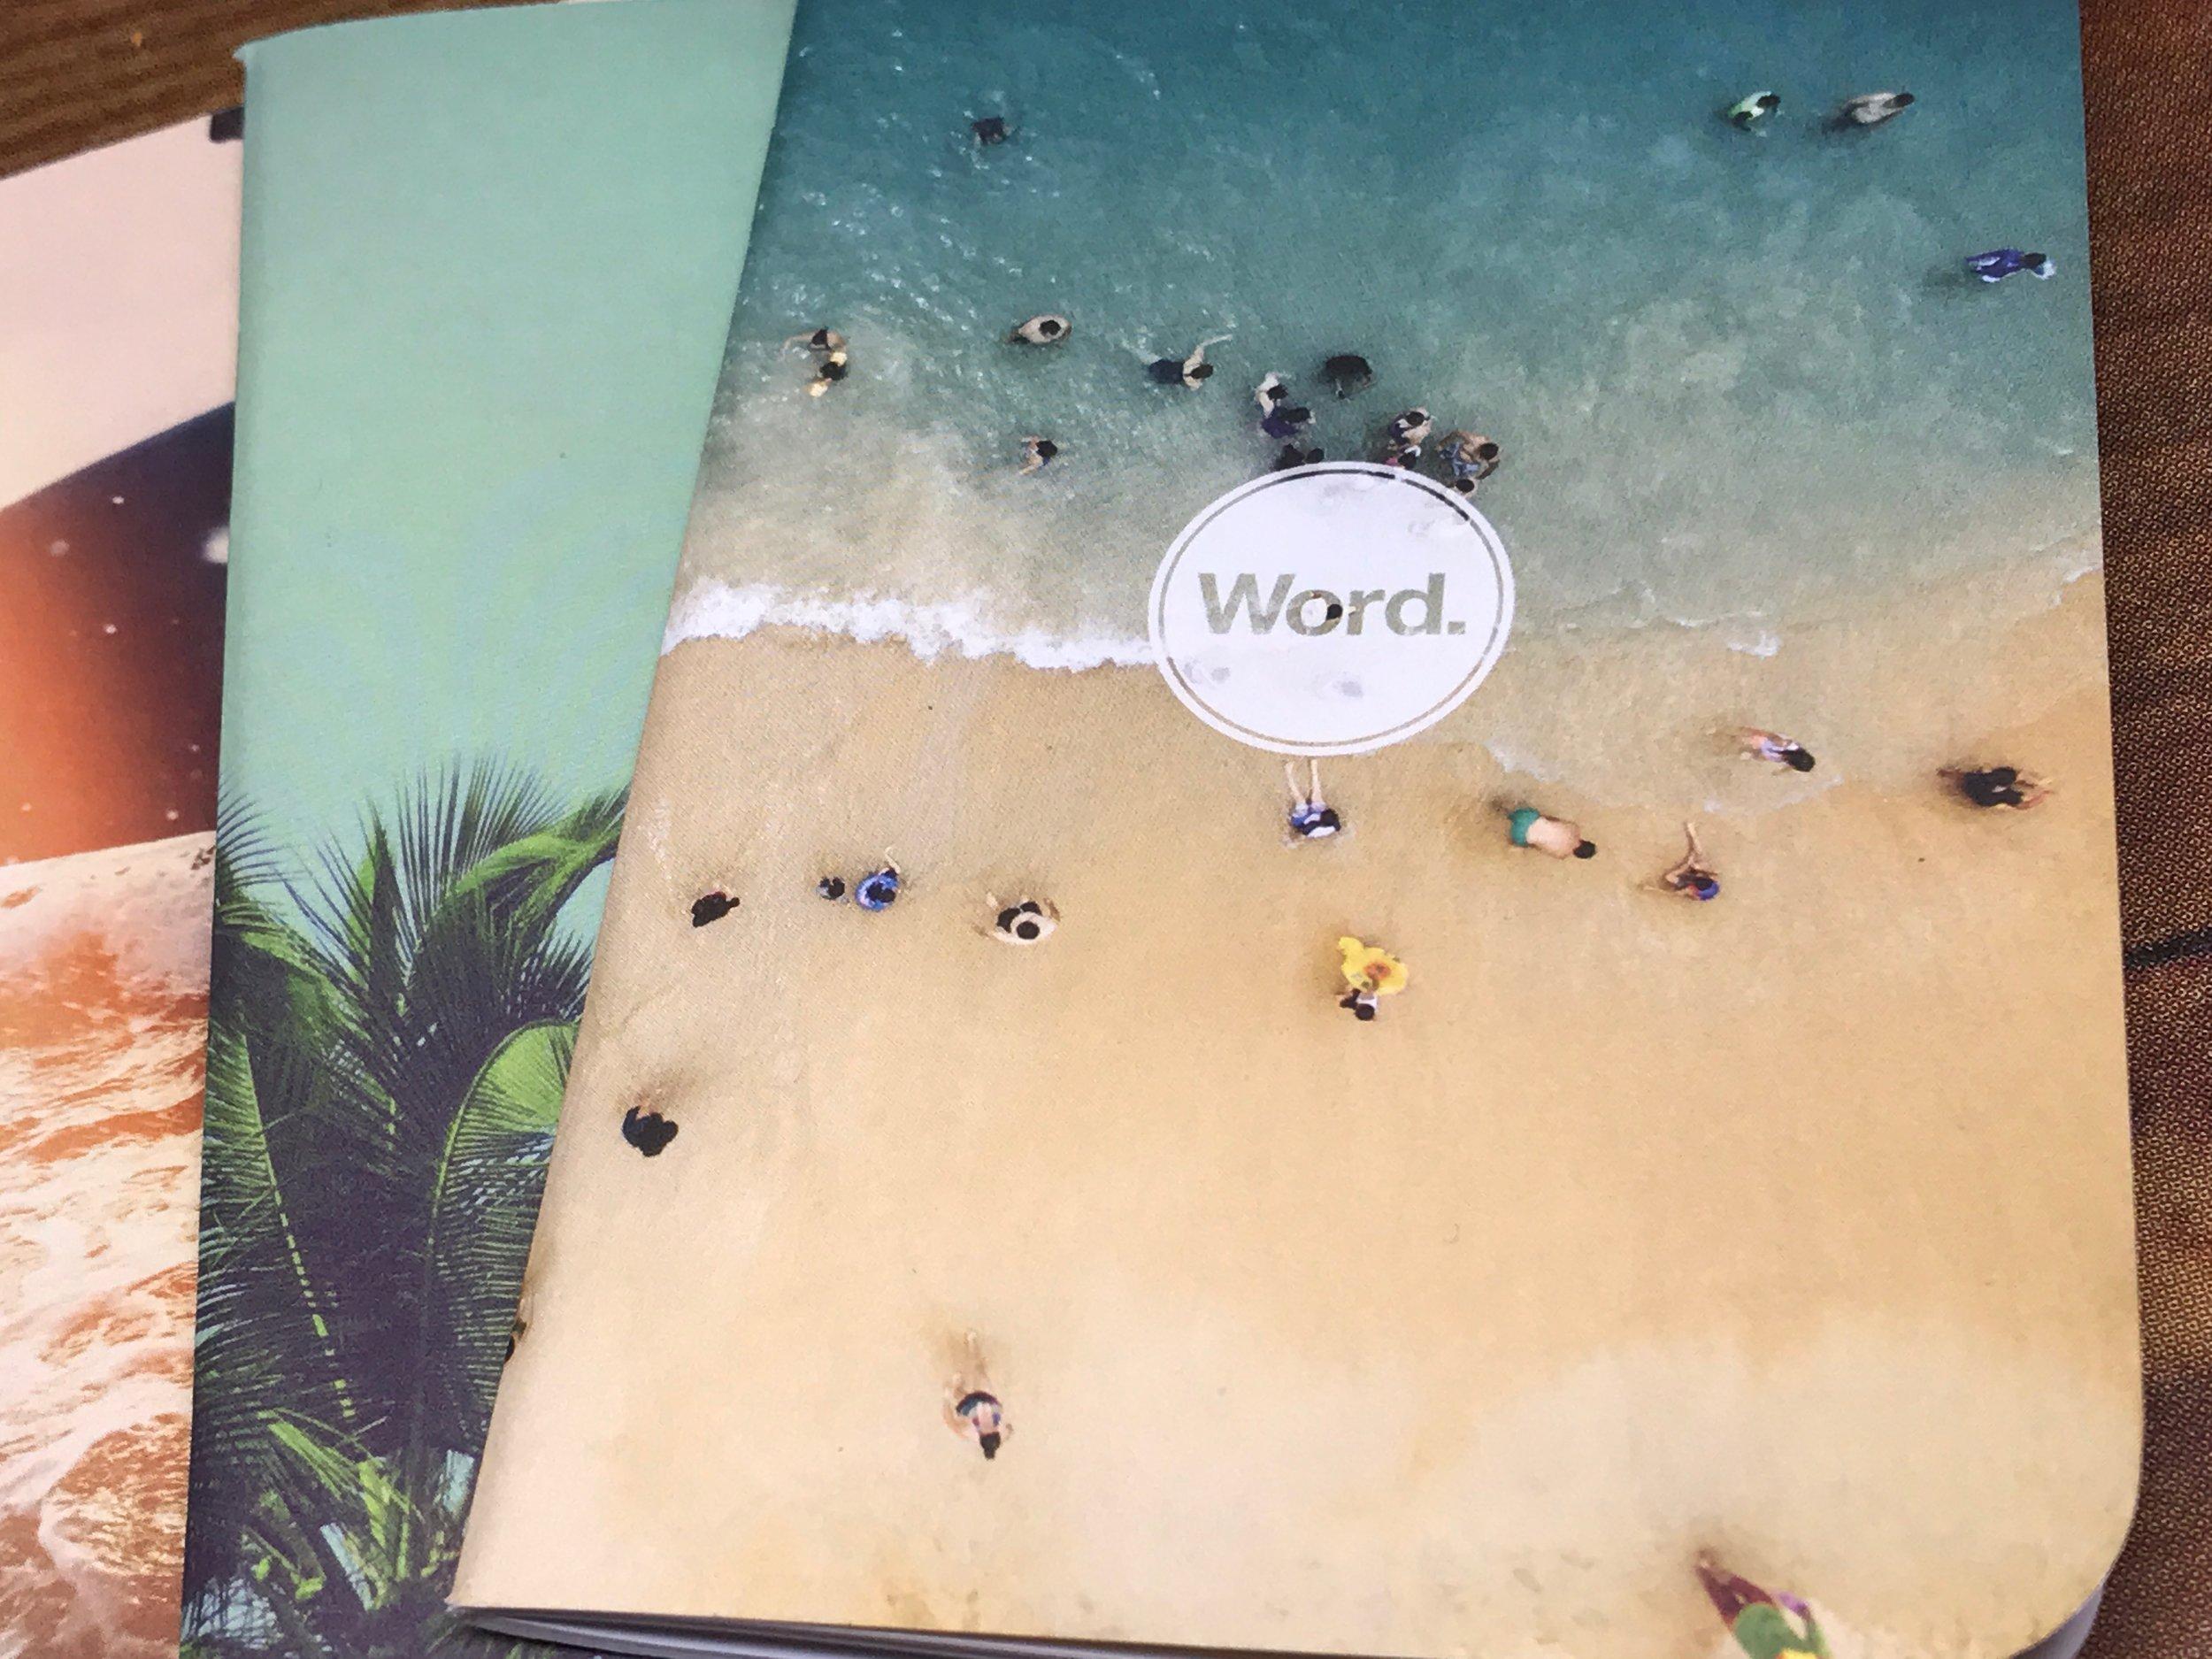 word-notebooks-beach-vibes-2.jpg